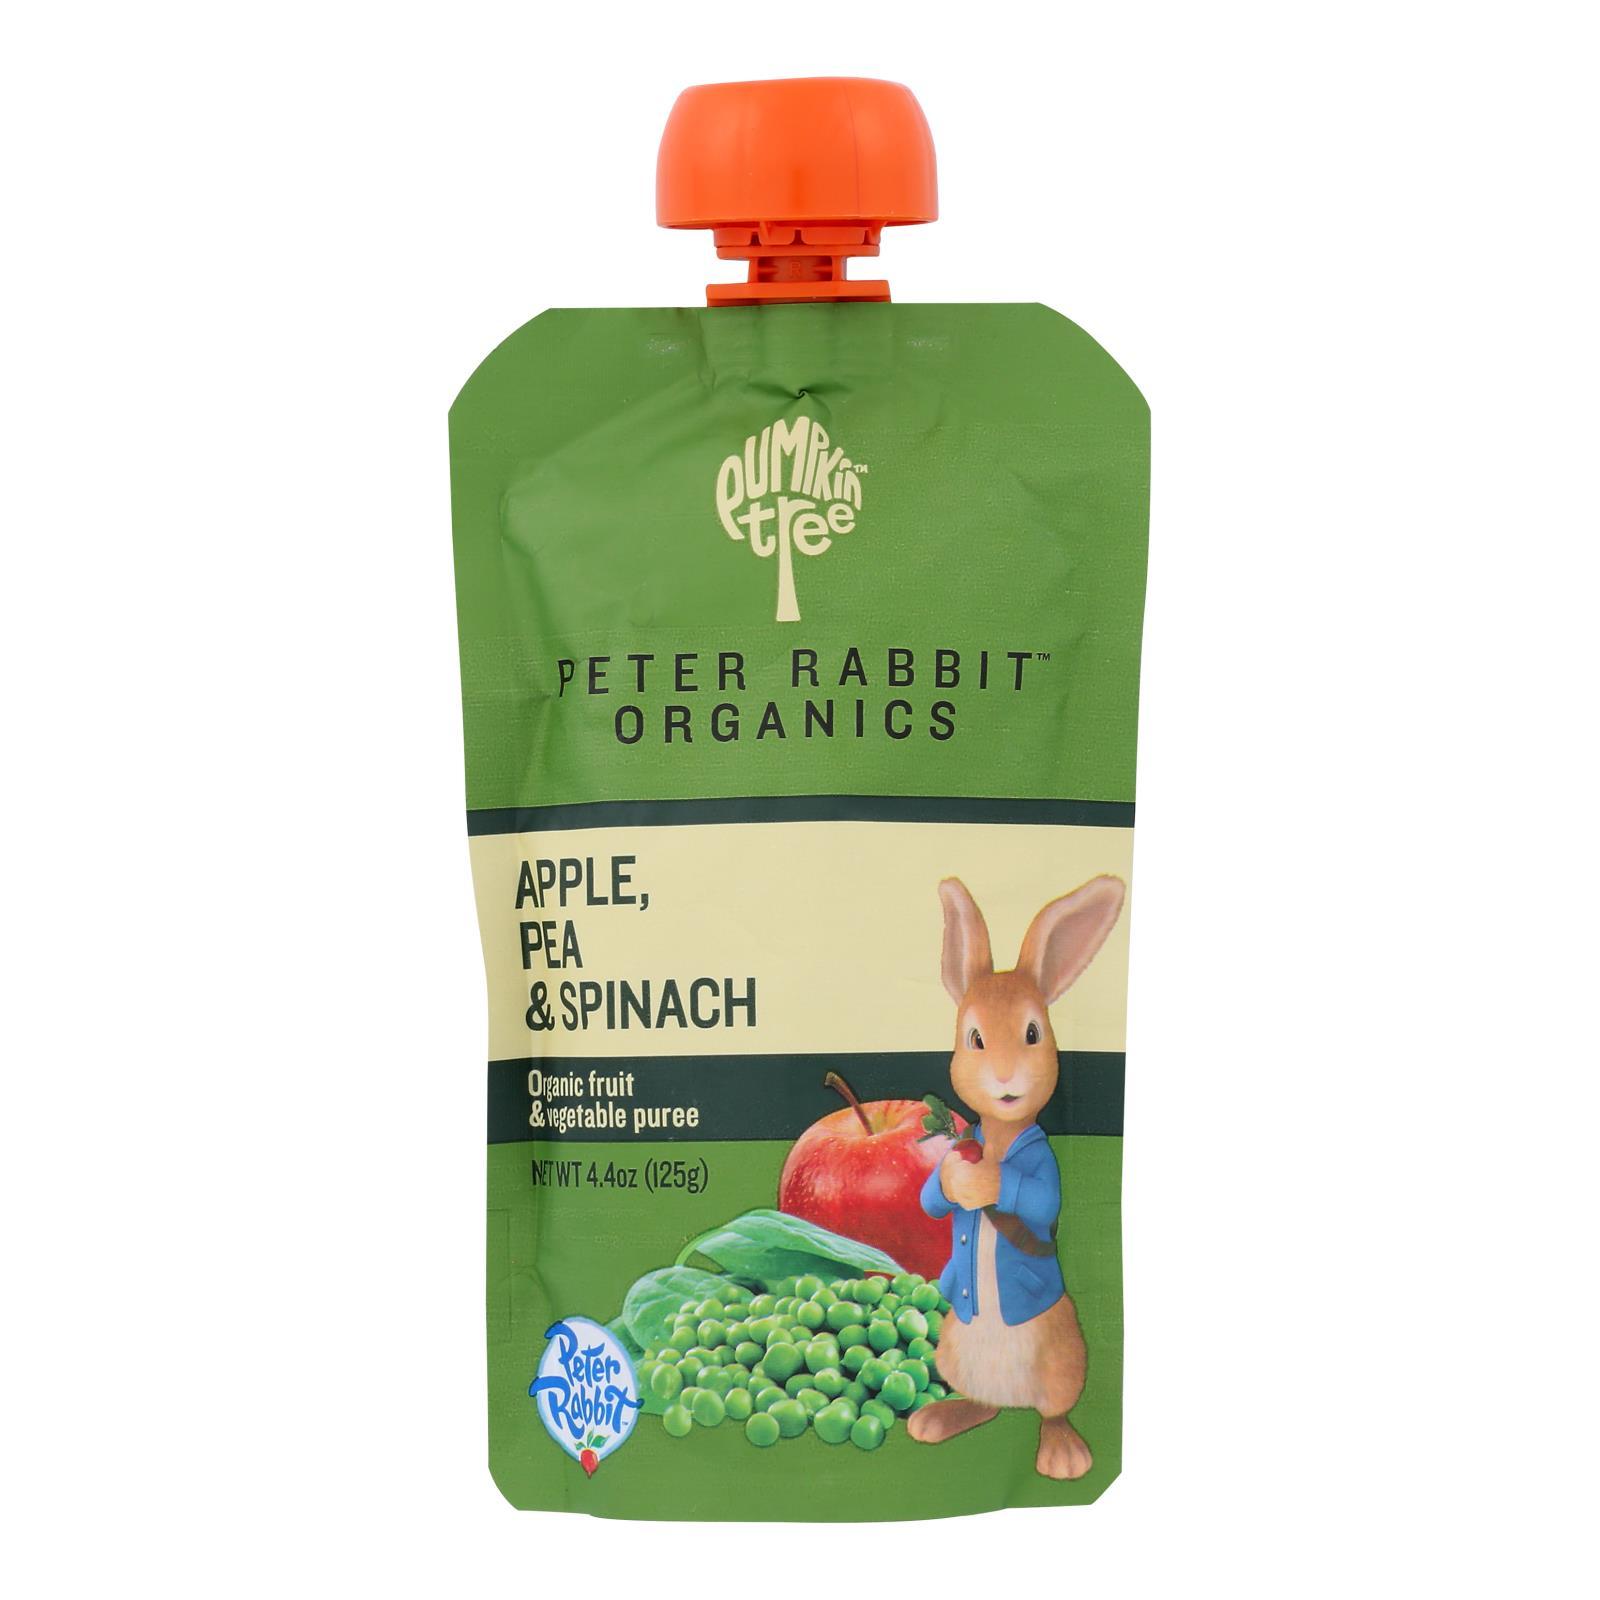 Peter Rabbit Organics Veggie Snacks - Pea Spinach and Apple - Case of 10 - 4.4 oz.